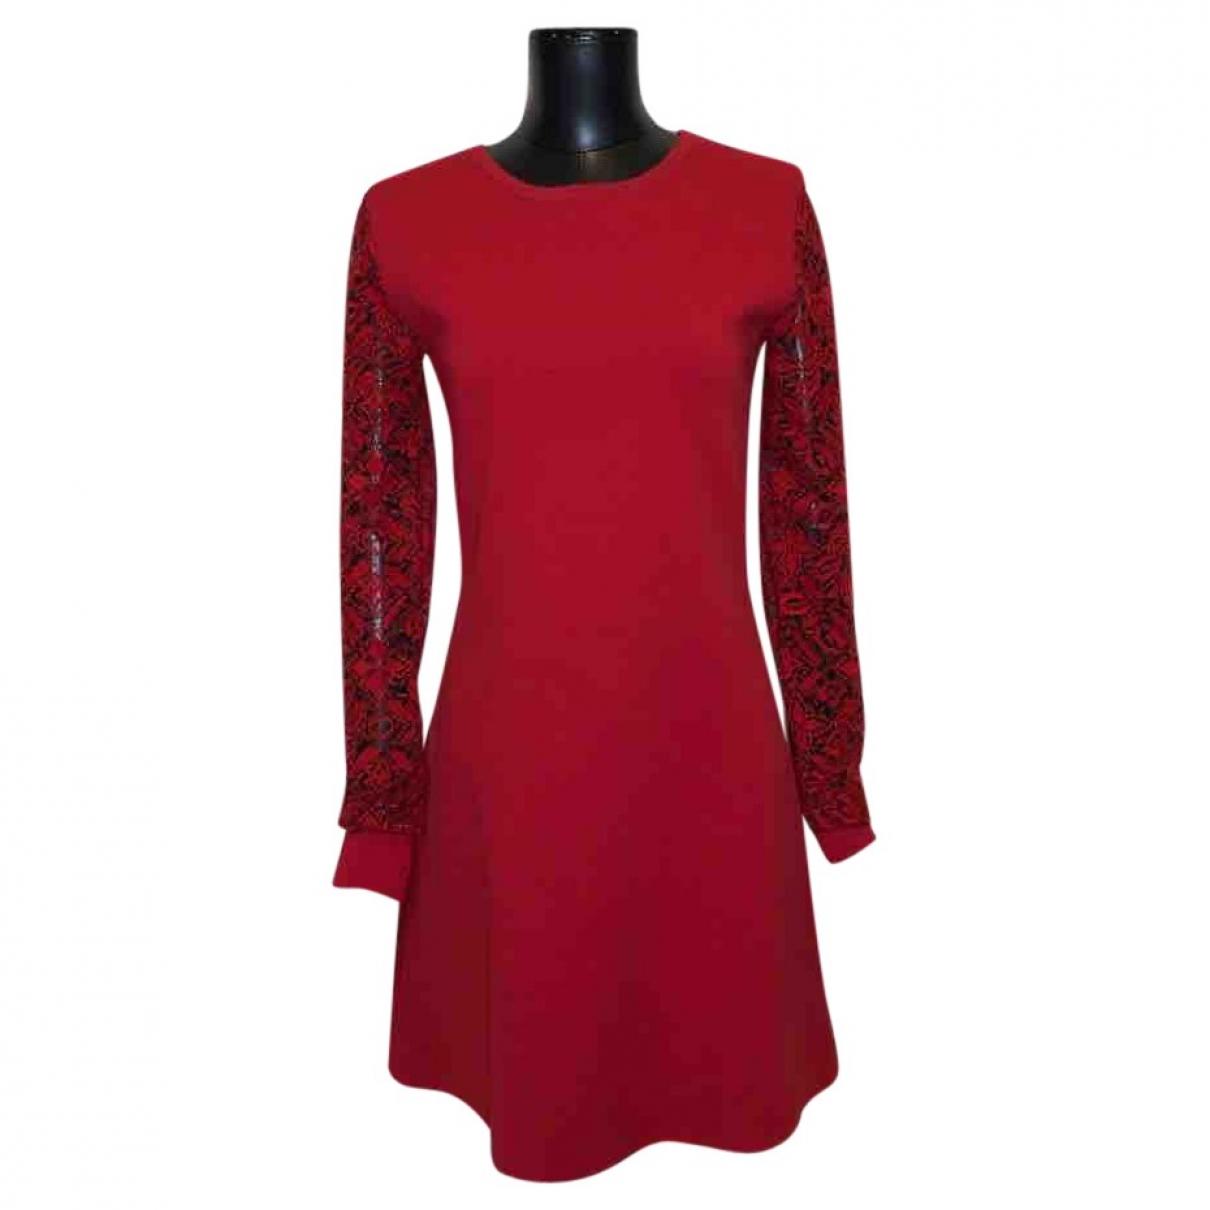 Louis Vuitton \N Red dress for Women S International